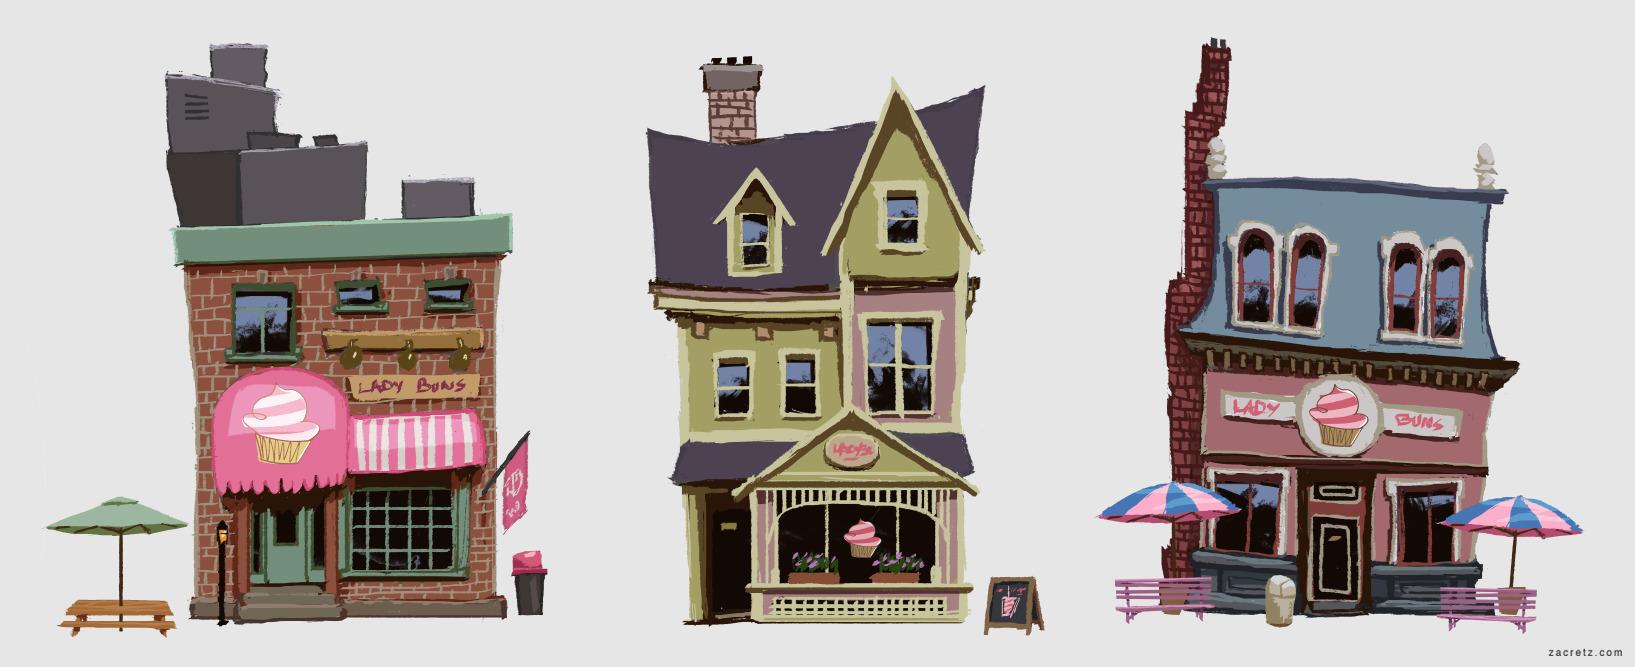 bakery shop designs - chadzacfilm - zacretz | ello